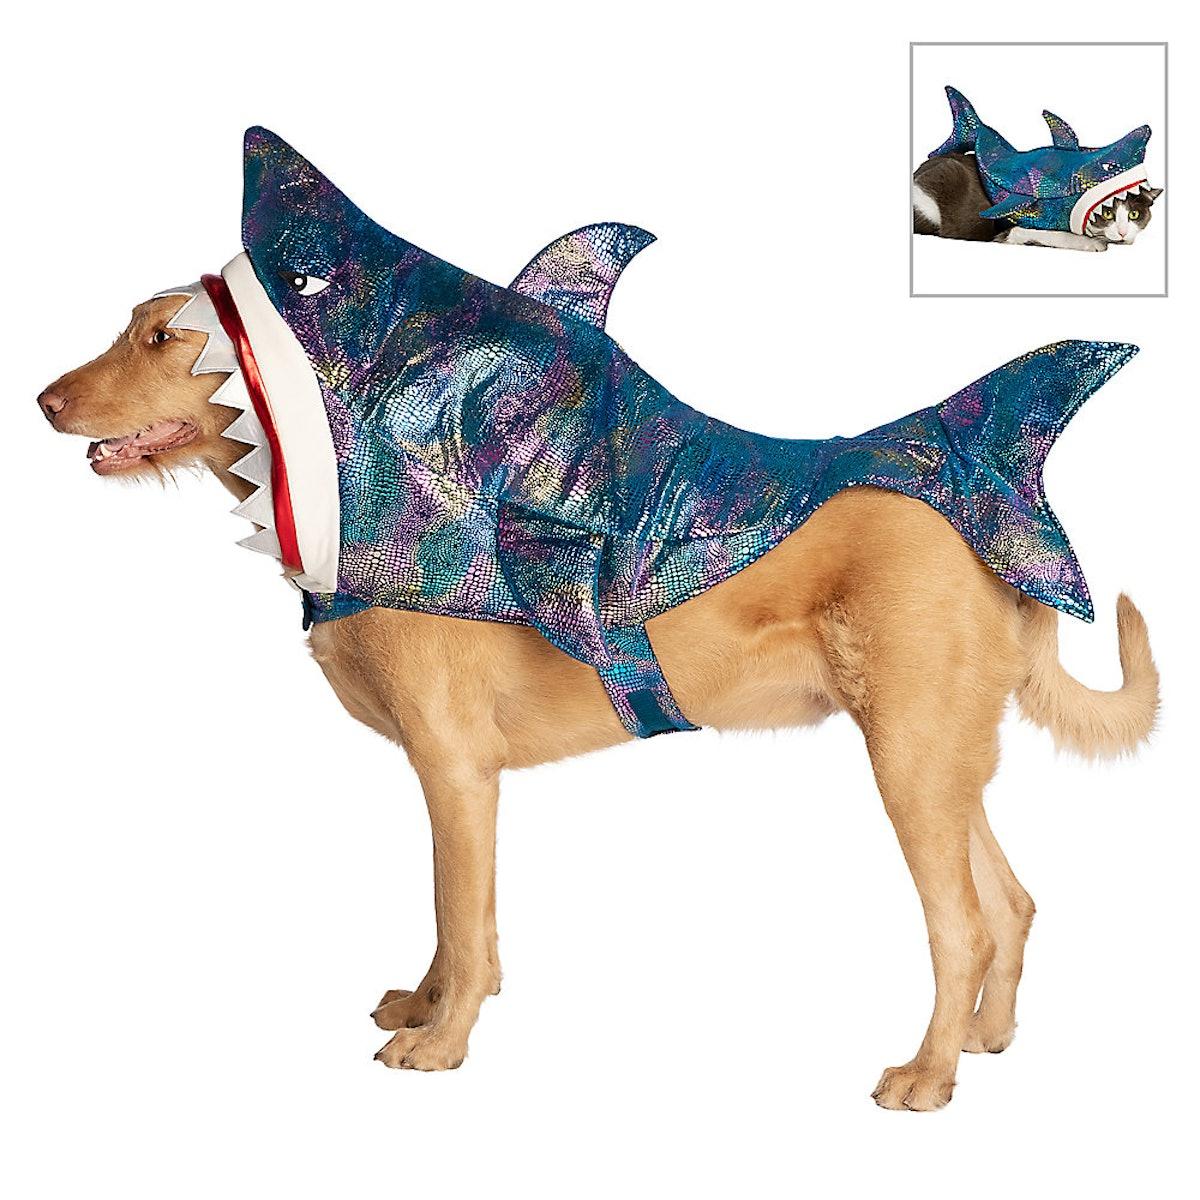 Thrills & Chills Halloween Shark Costume